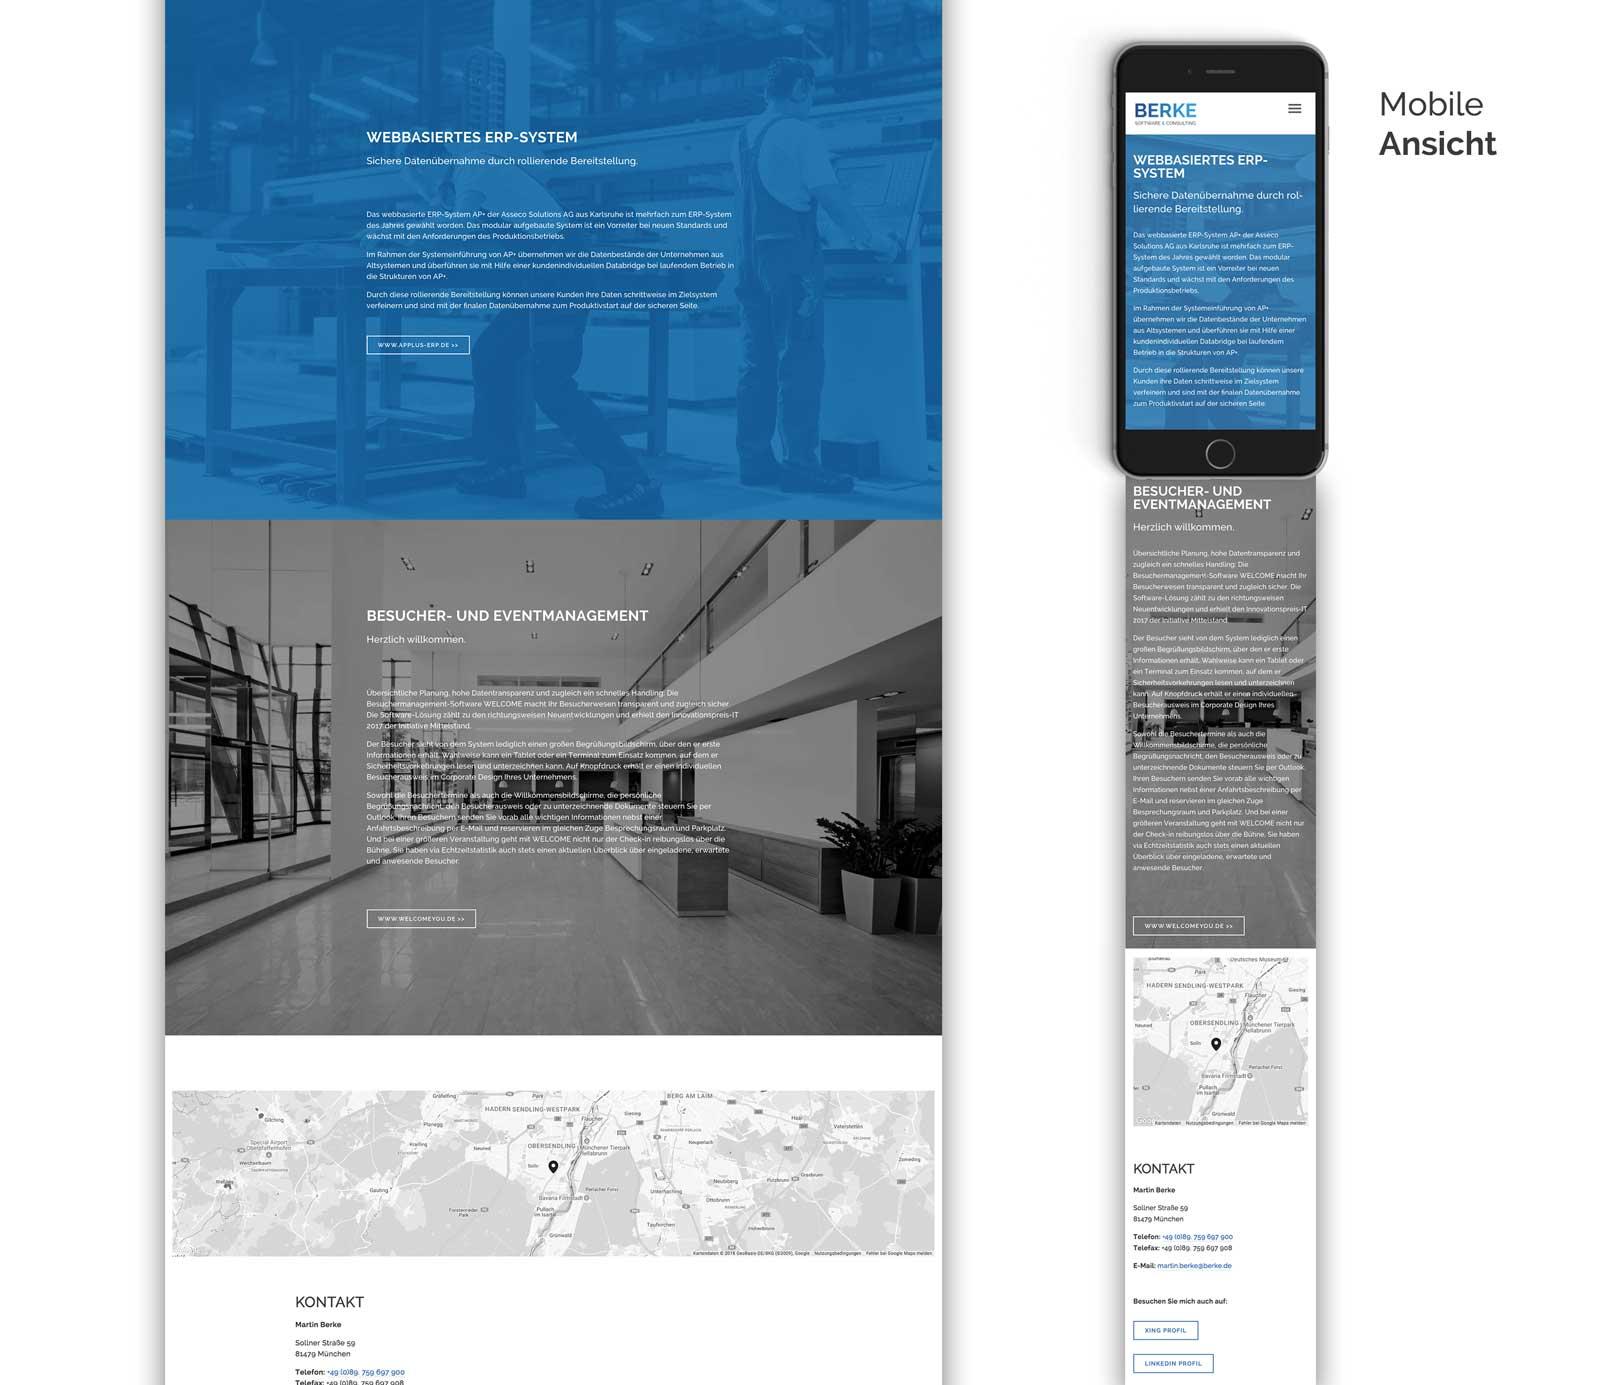 Berke_IT_Corporate_Design_Responsive_Webdesign_7.jpg